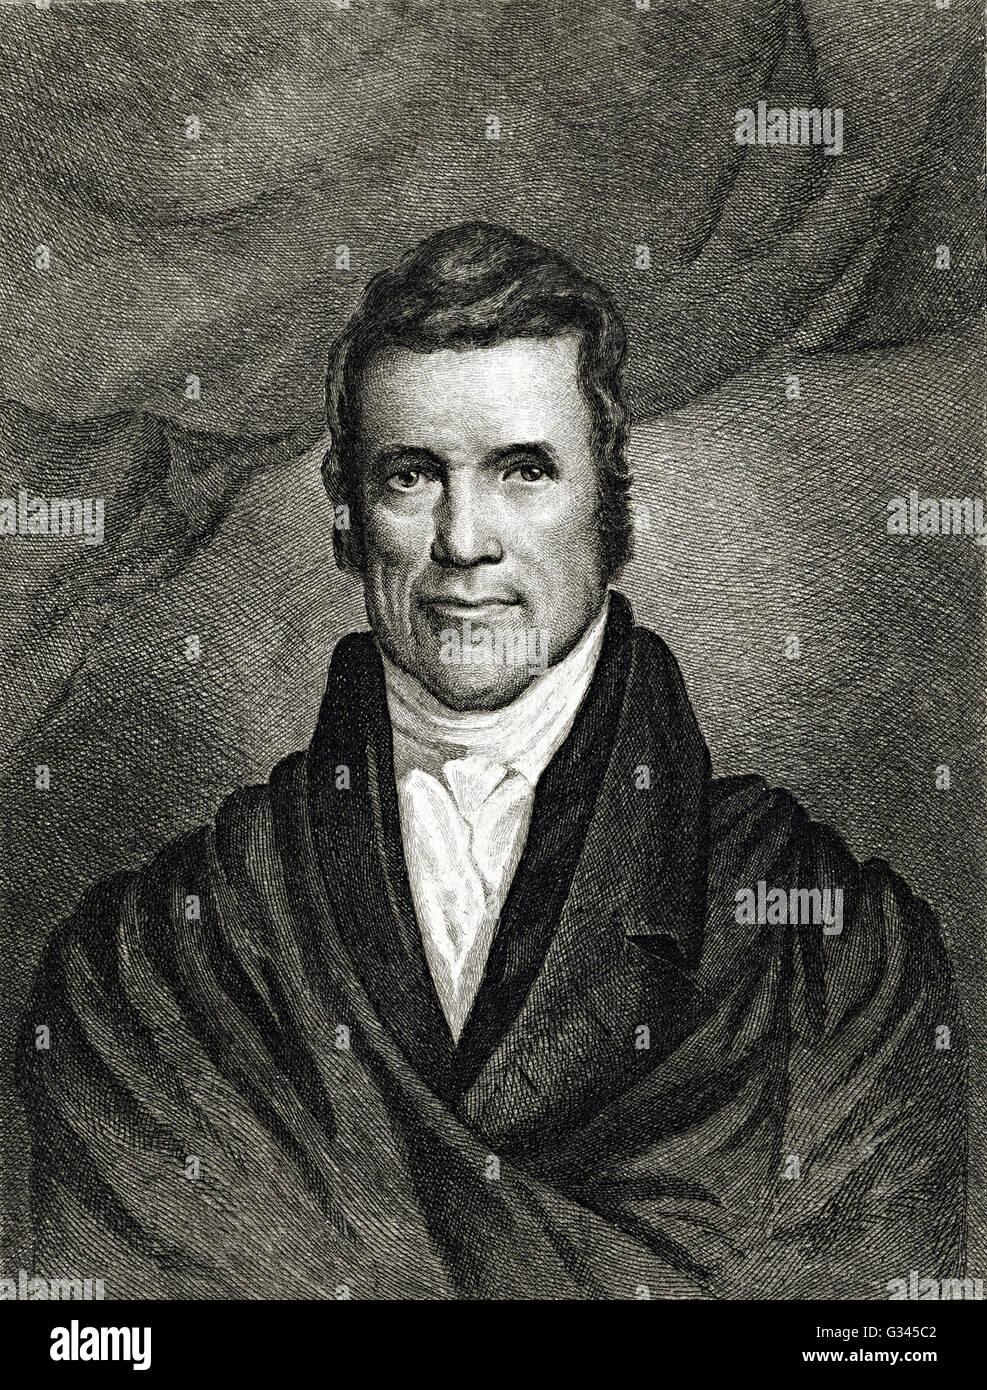 John Marshall - Stock Image